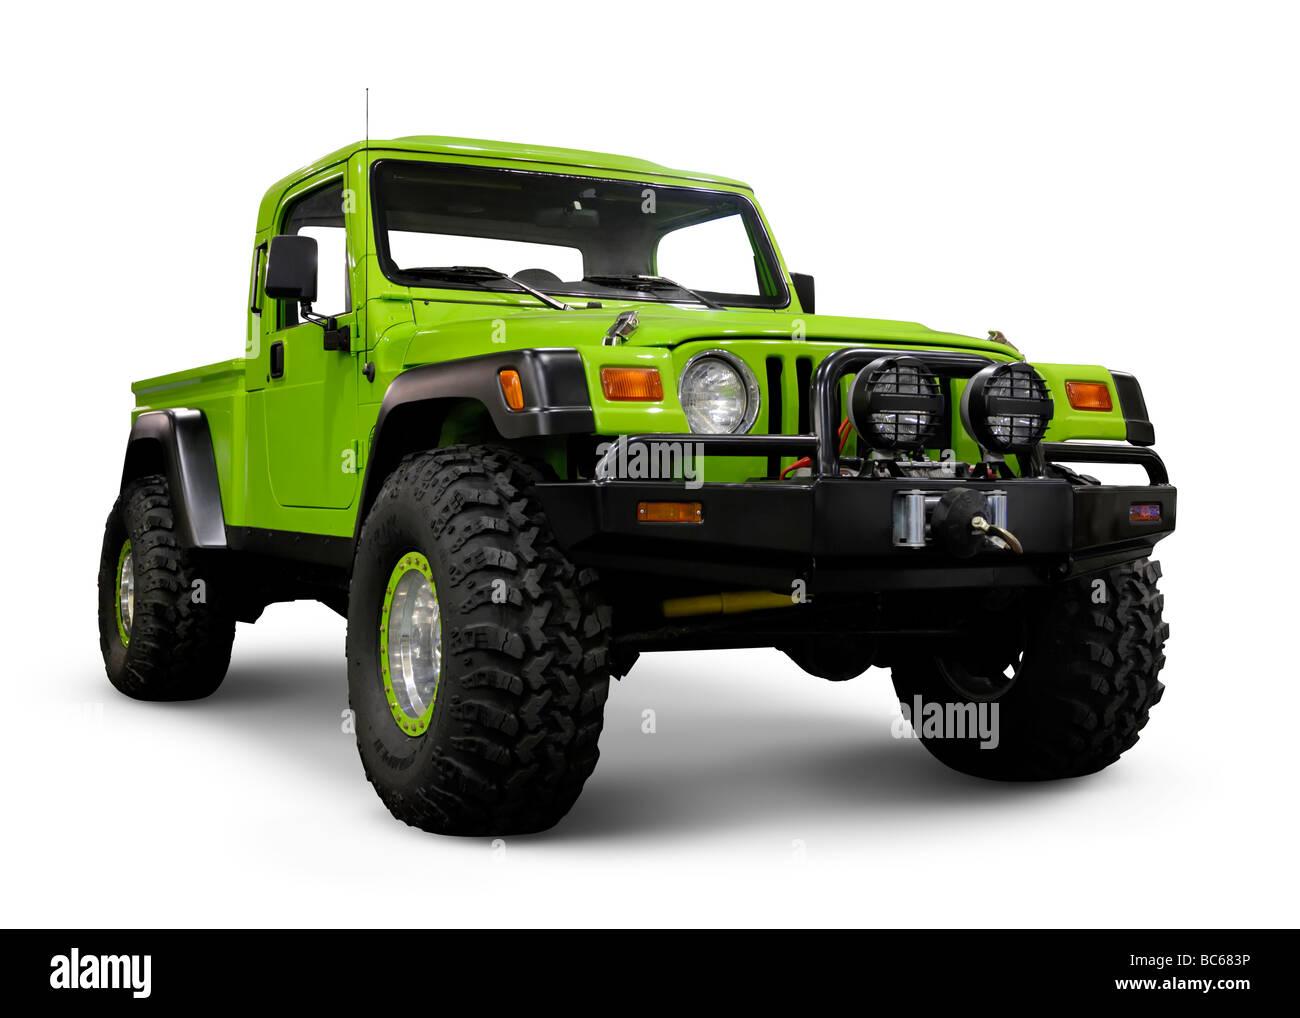 White Jeep Wrangler 2018 >> Custom Jeep Wrangler TJ with large wheels Stock Photo, Royalty Free Image: 24724330 - Alamy